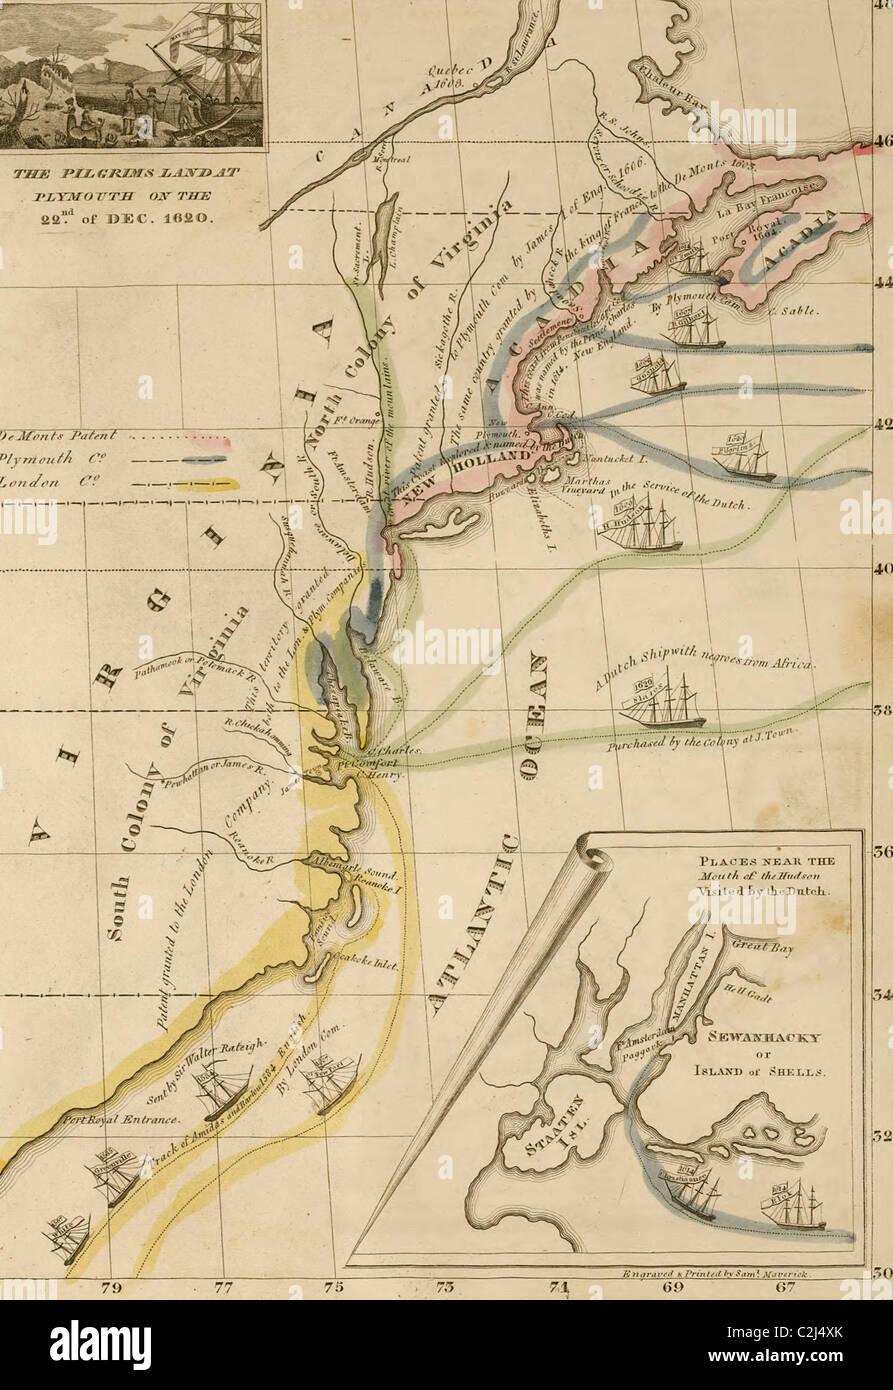 1620 - Pilgrims land at Plymouth Rock - Stock Image